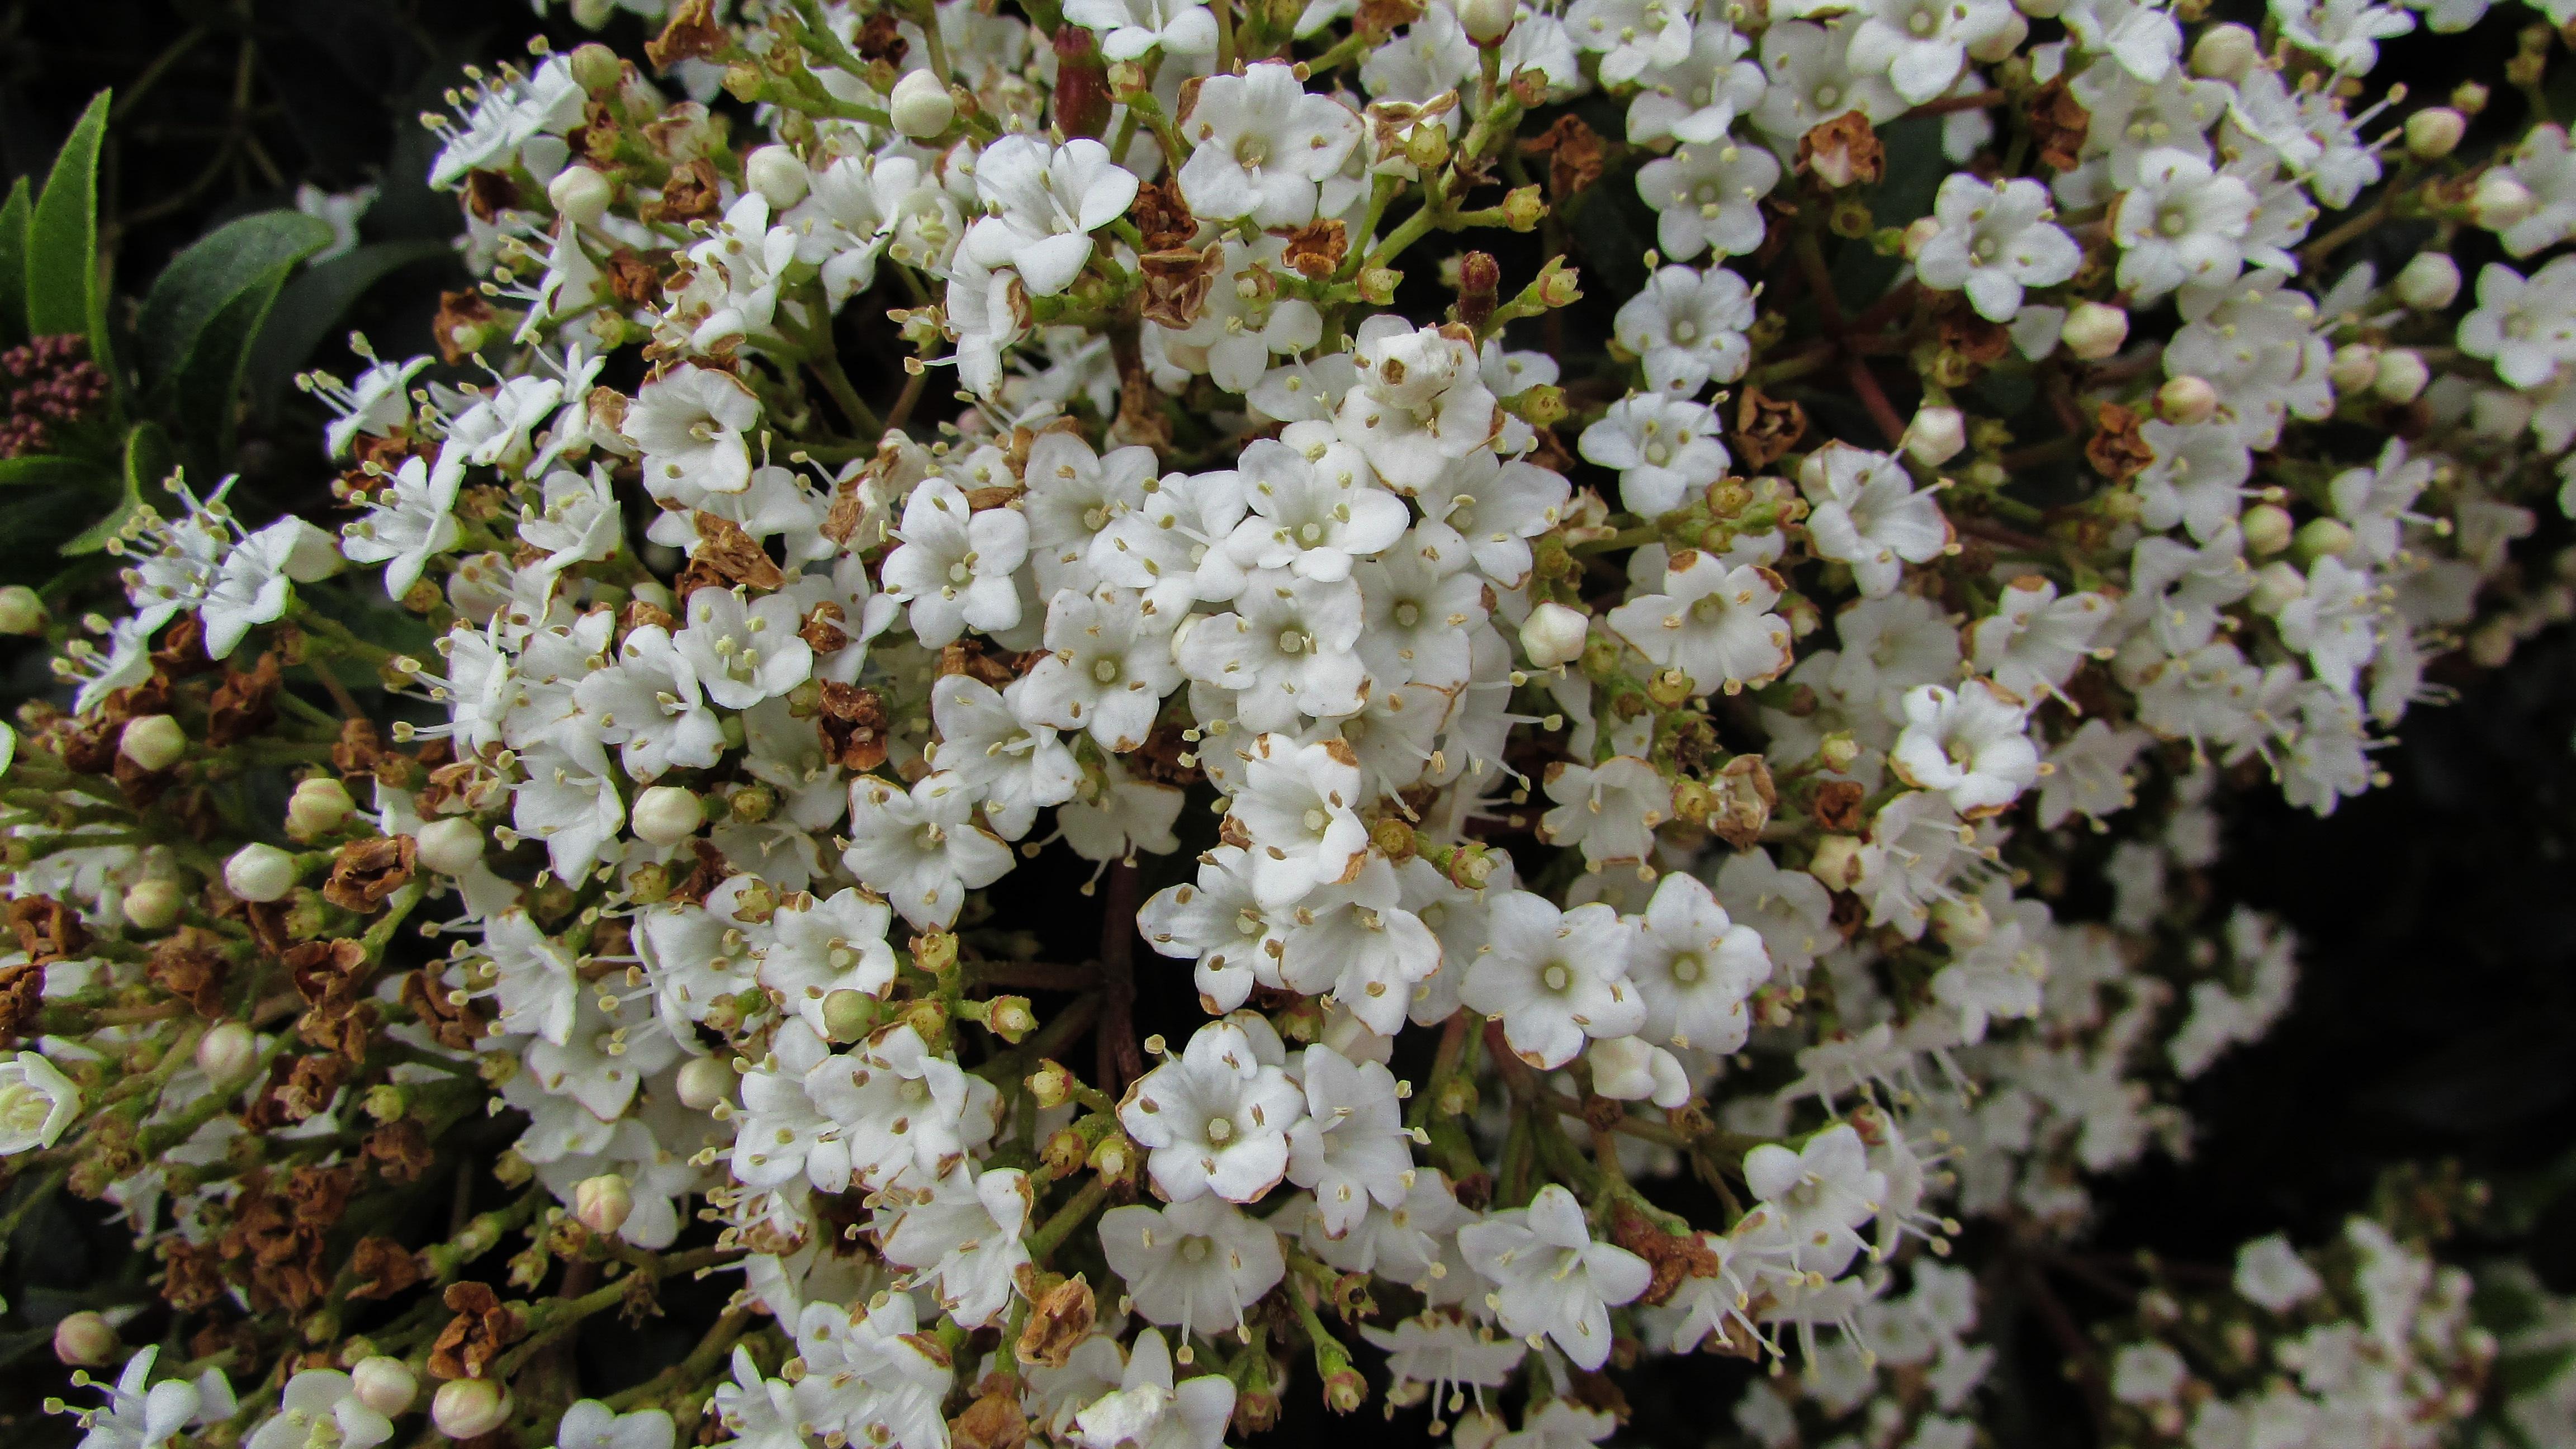 Free Images Branch Blossom Flower Spring Produce Botany